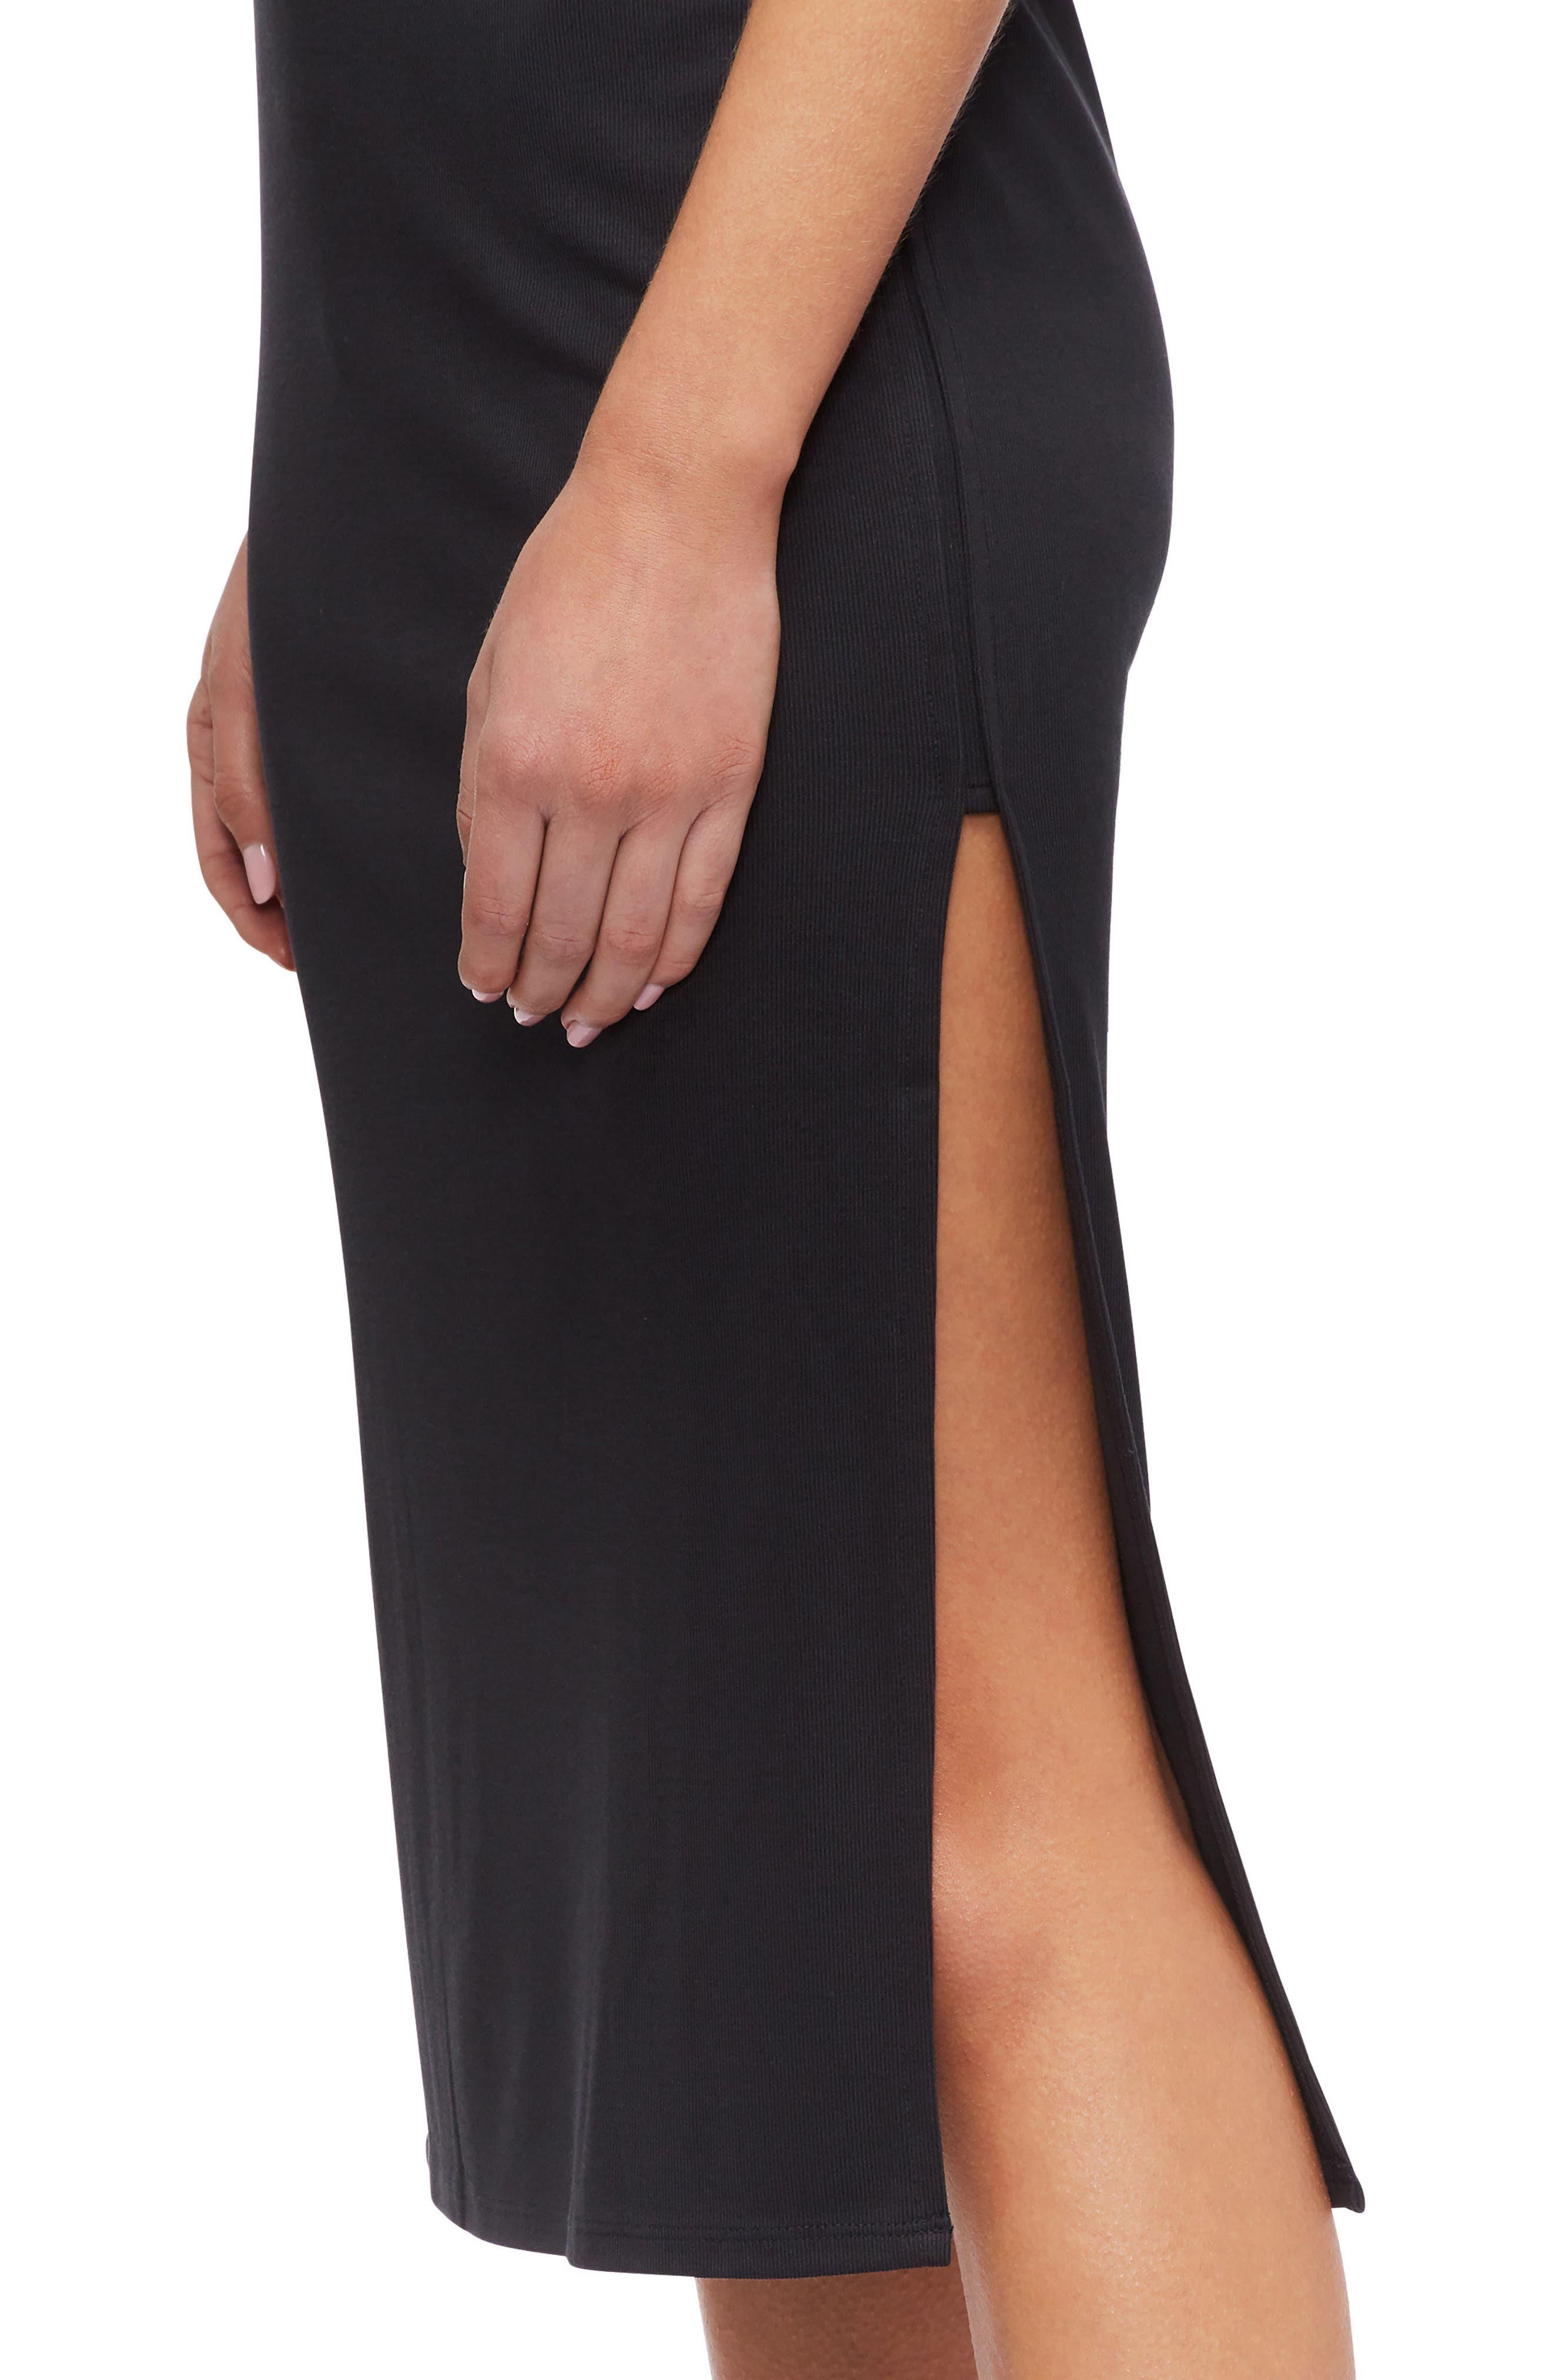 Icara Cover-Up Tank Dress,                             Alternate thumbnail 4, color,                             Black